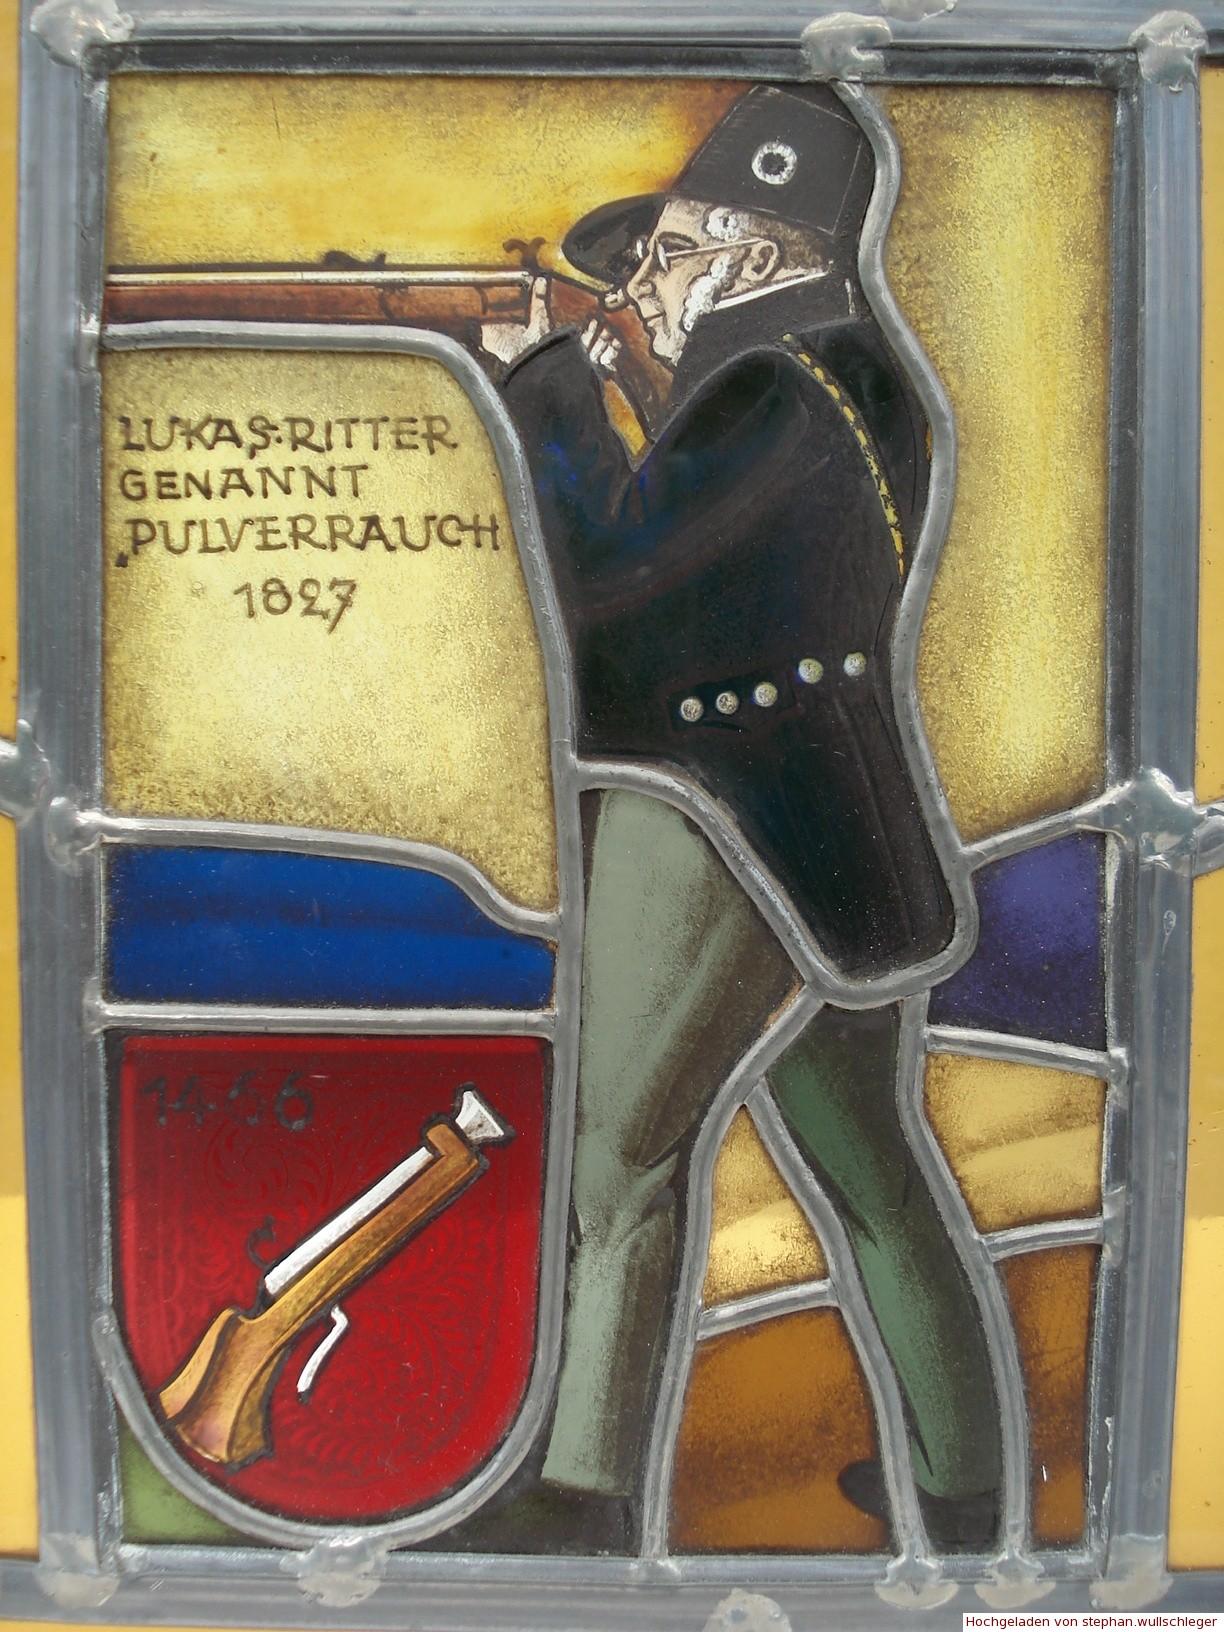 Wappenscheibe Ritter Pulverrauch